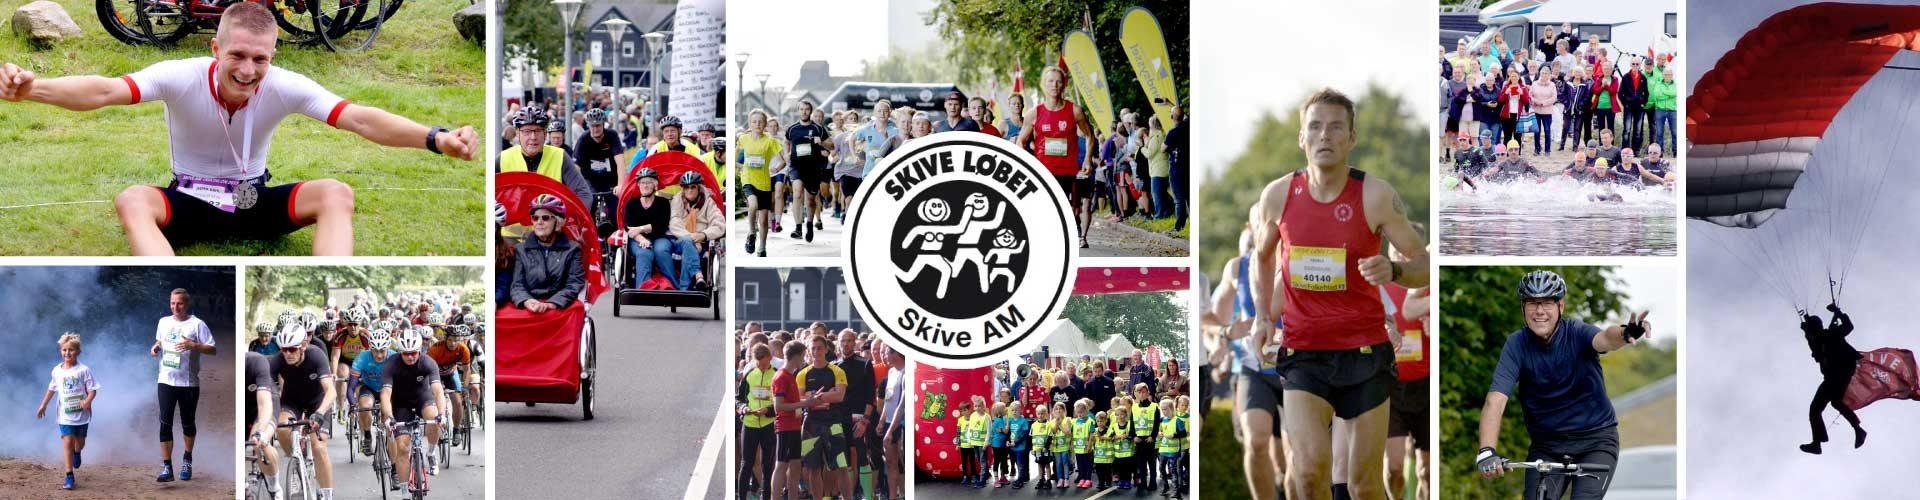 Sportstiming Skive Løbet 2018